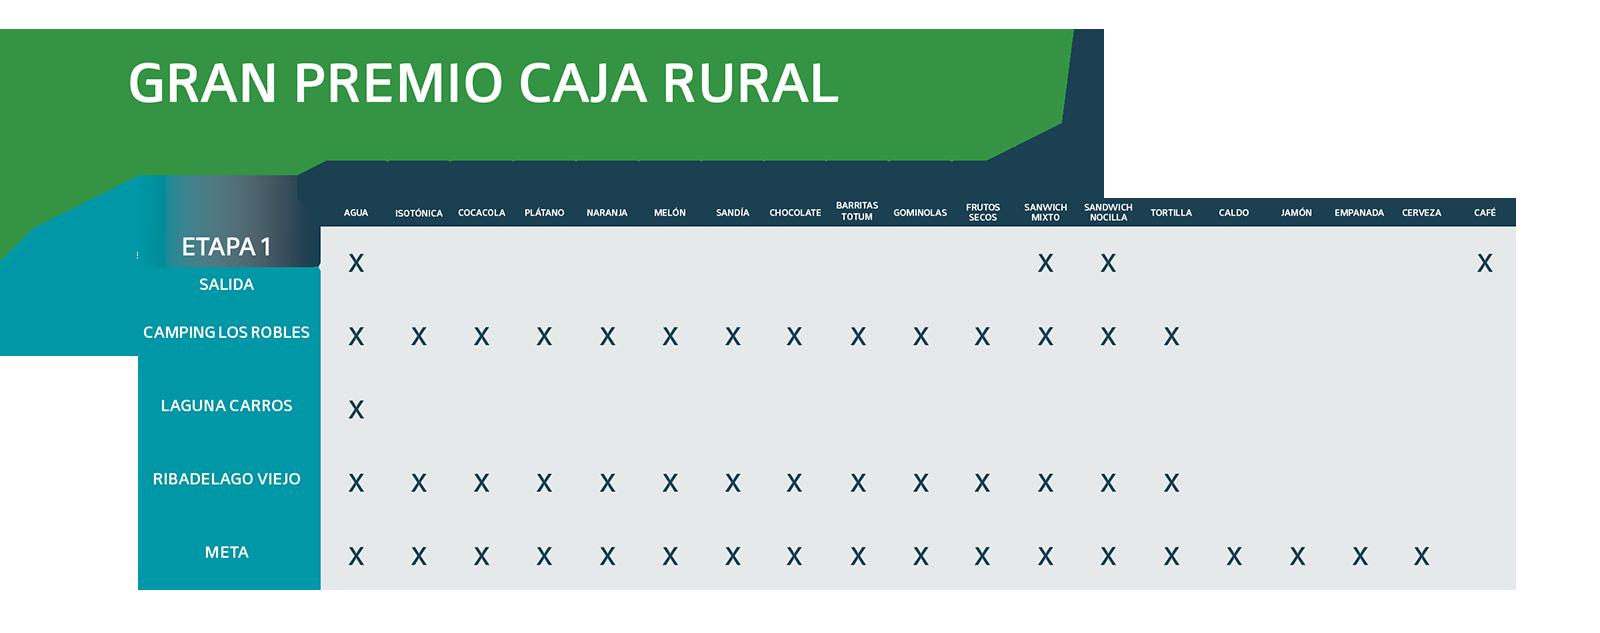 Avituallamiento Gran Premio Caja Rural 2021